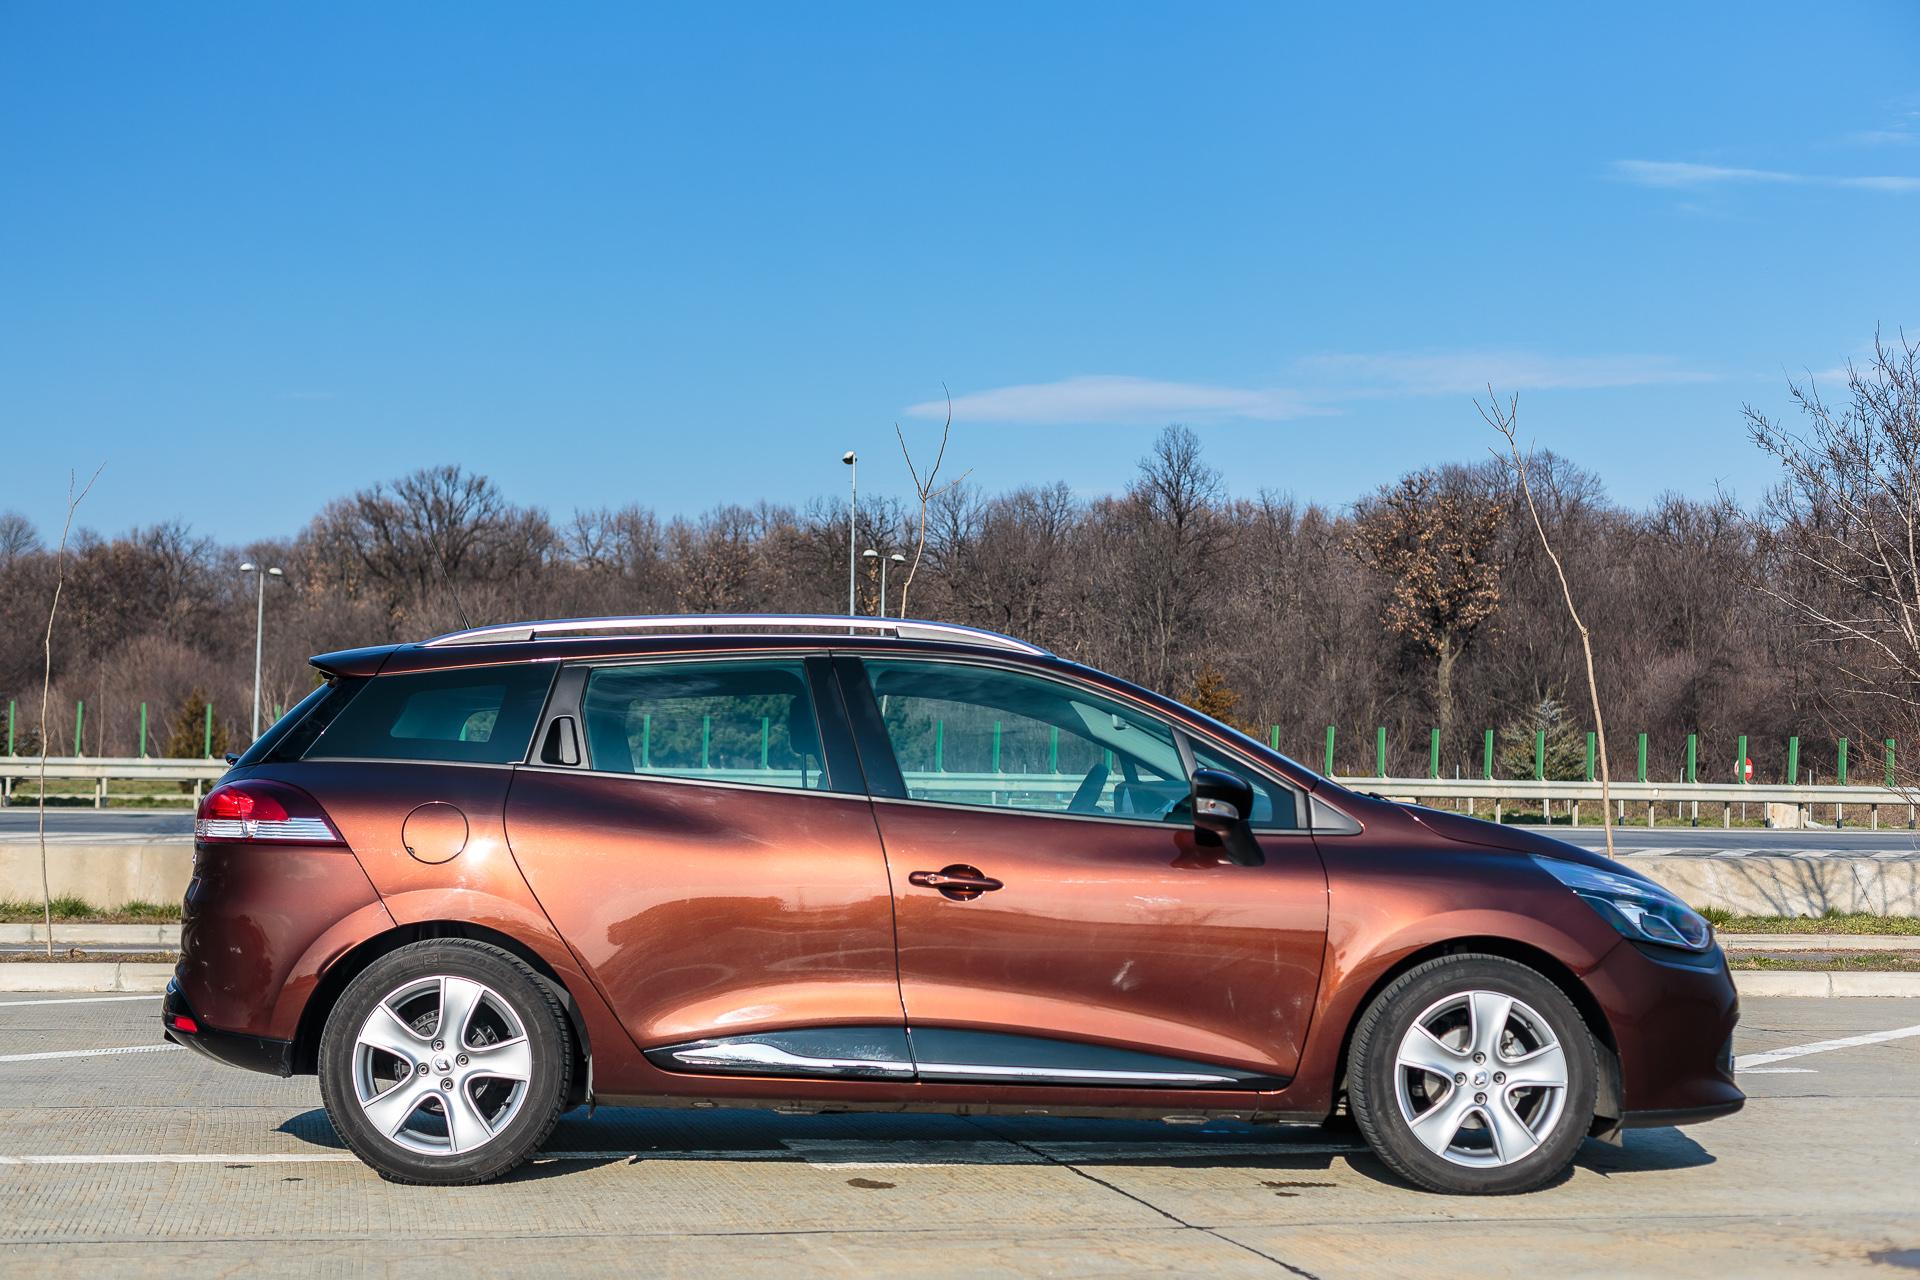 Drive test Renault Clio Estate – 1.5 dCi